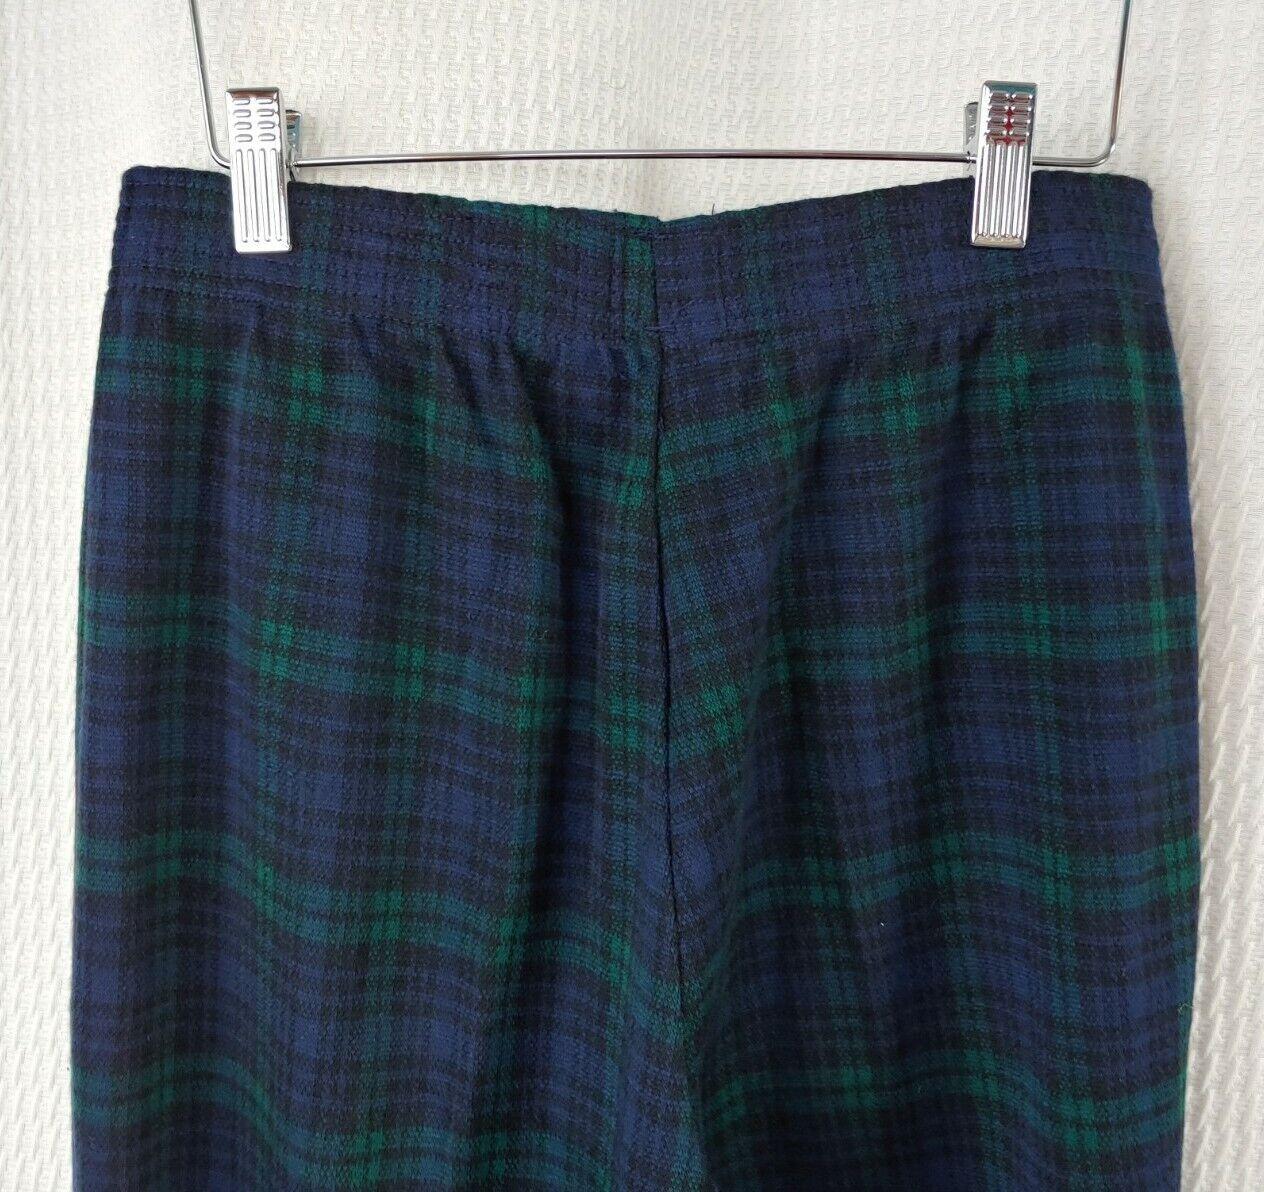 Vintage Navy & Green Plaid Knit Pants - image 5